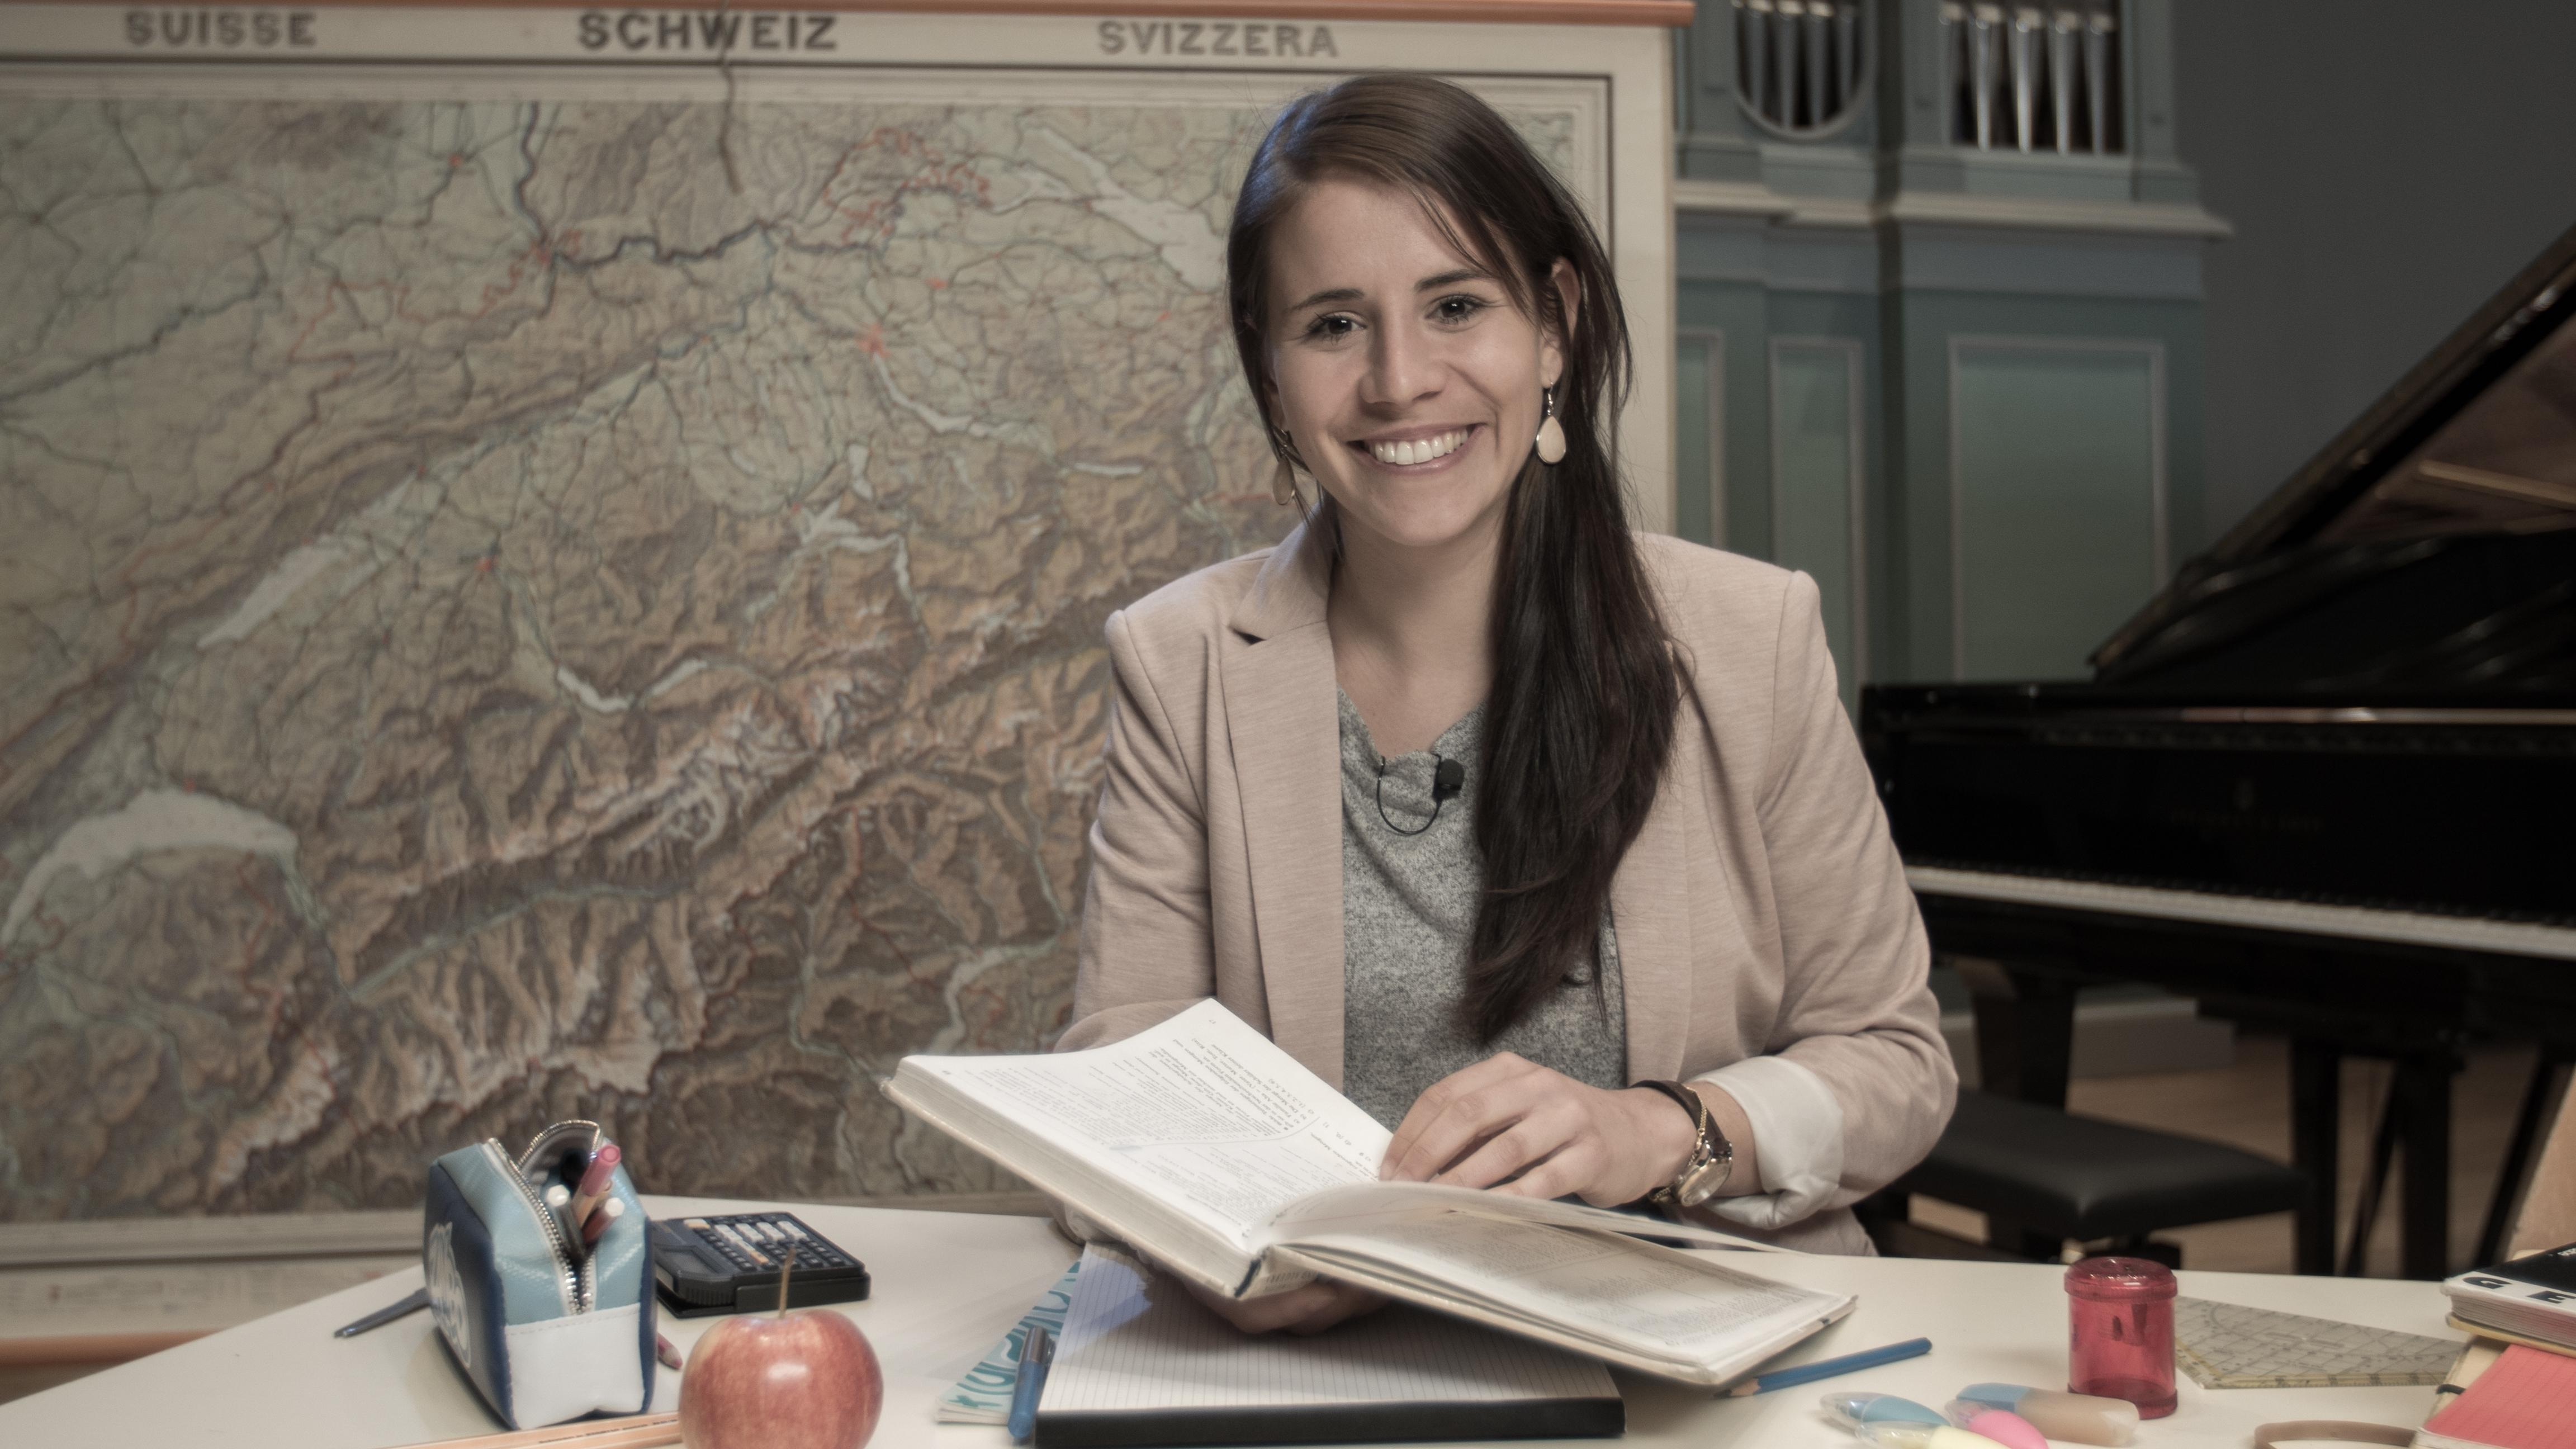 Eliane Müller jongliert mit Zahlen